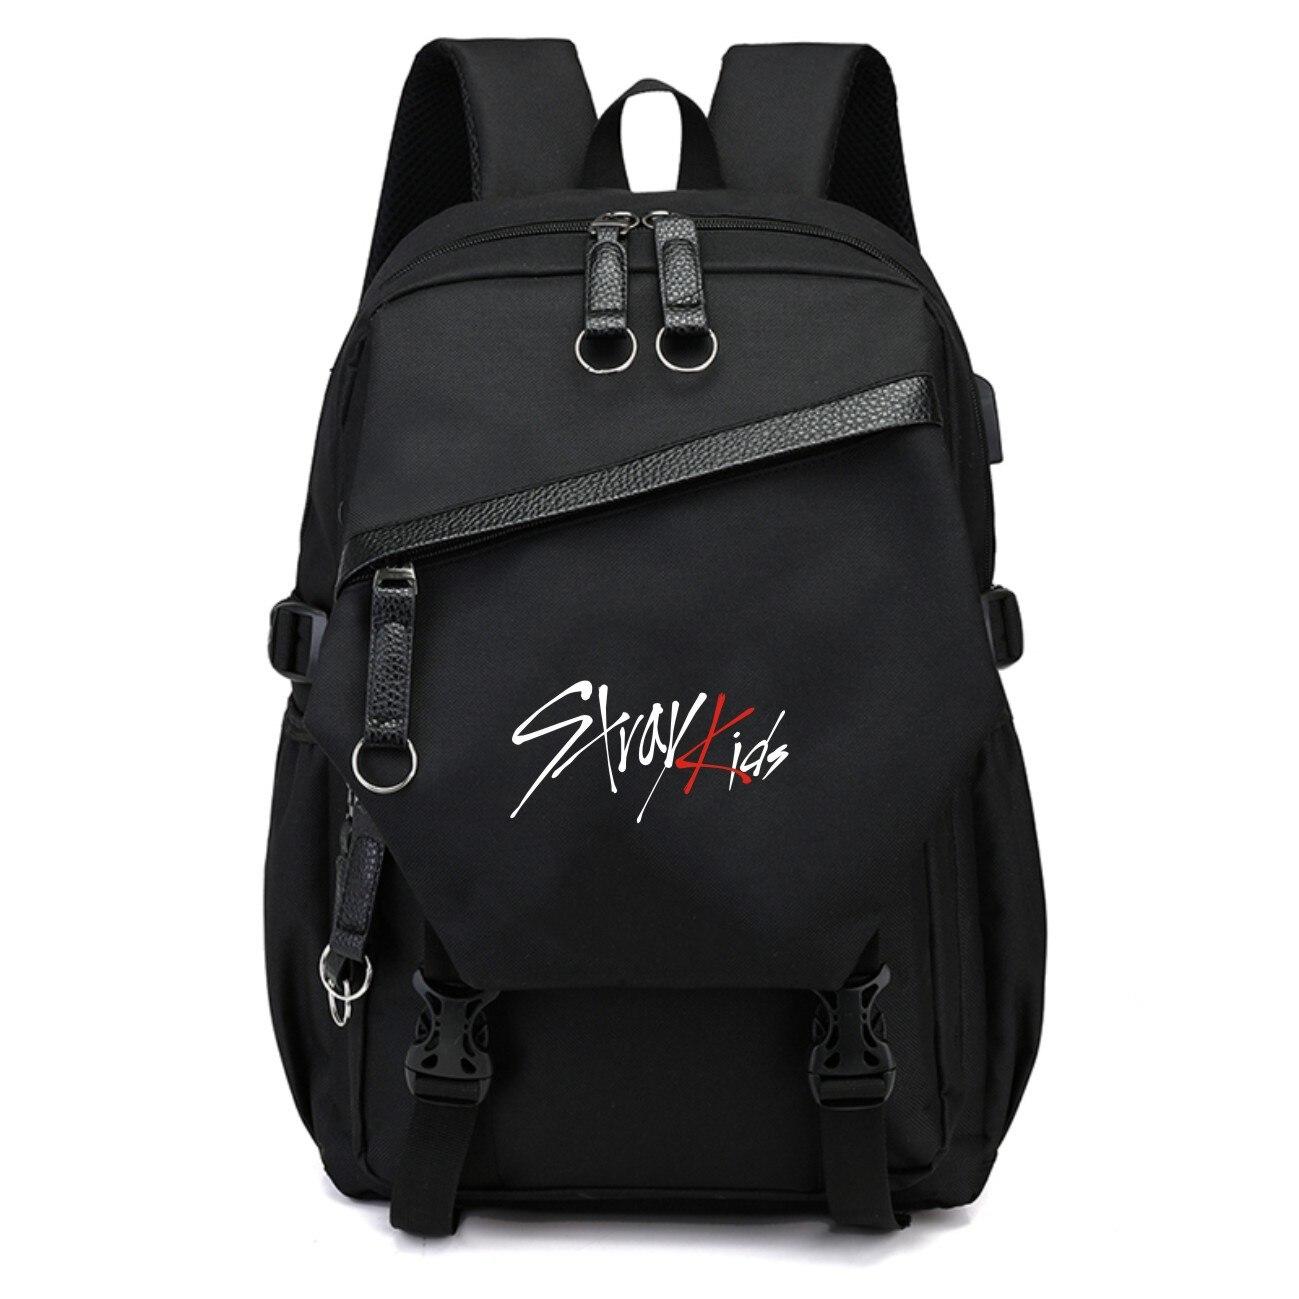 KPOP coreano niños perdidos mochila de moda negro de viaje bolsas de la Escuela de gran capacidad de poliéster tela de Kpop niños perdidos suministros